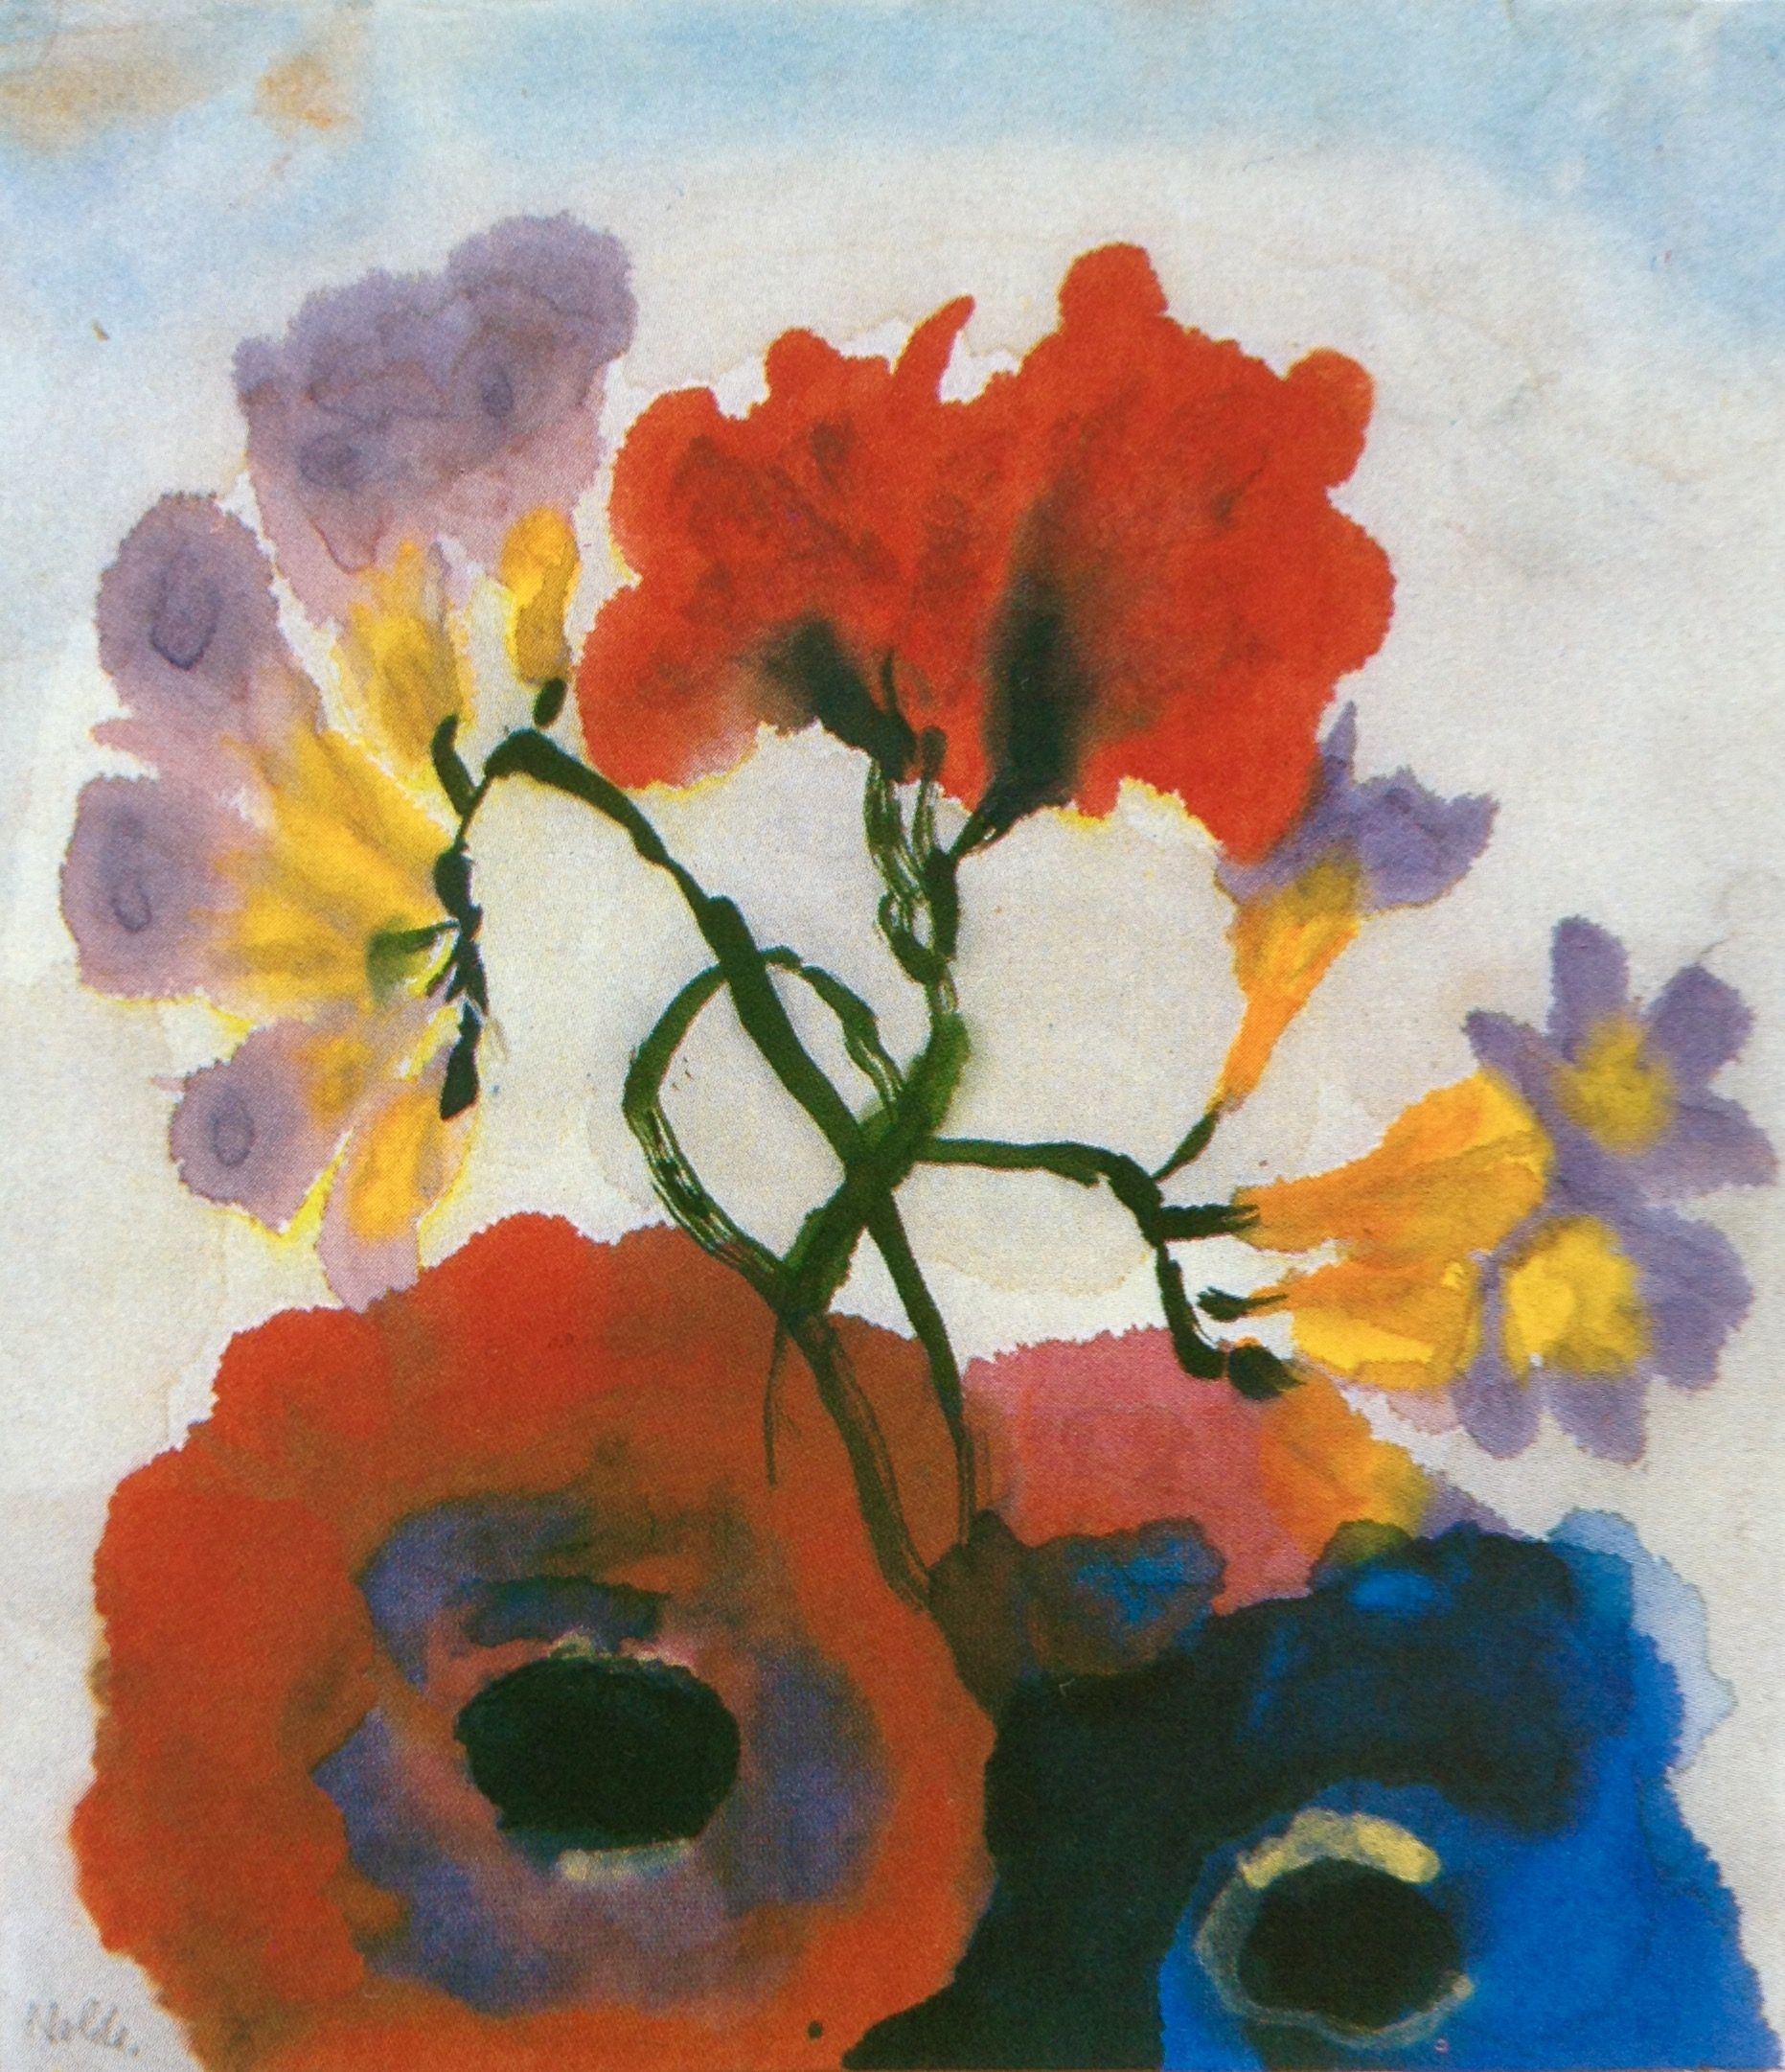 Alubilder Claude Monet Die Mohnblumen 1873 Mohnblume Monet Claude Monet